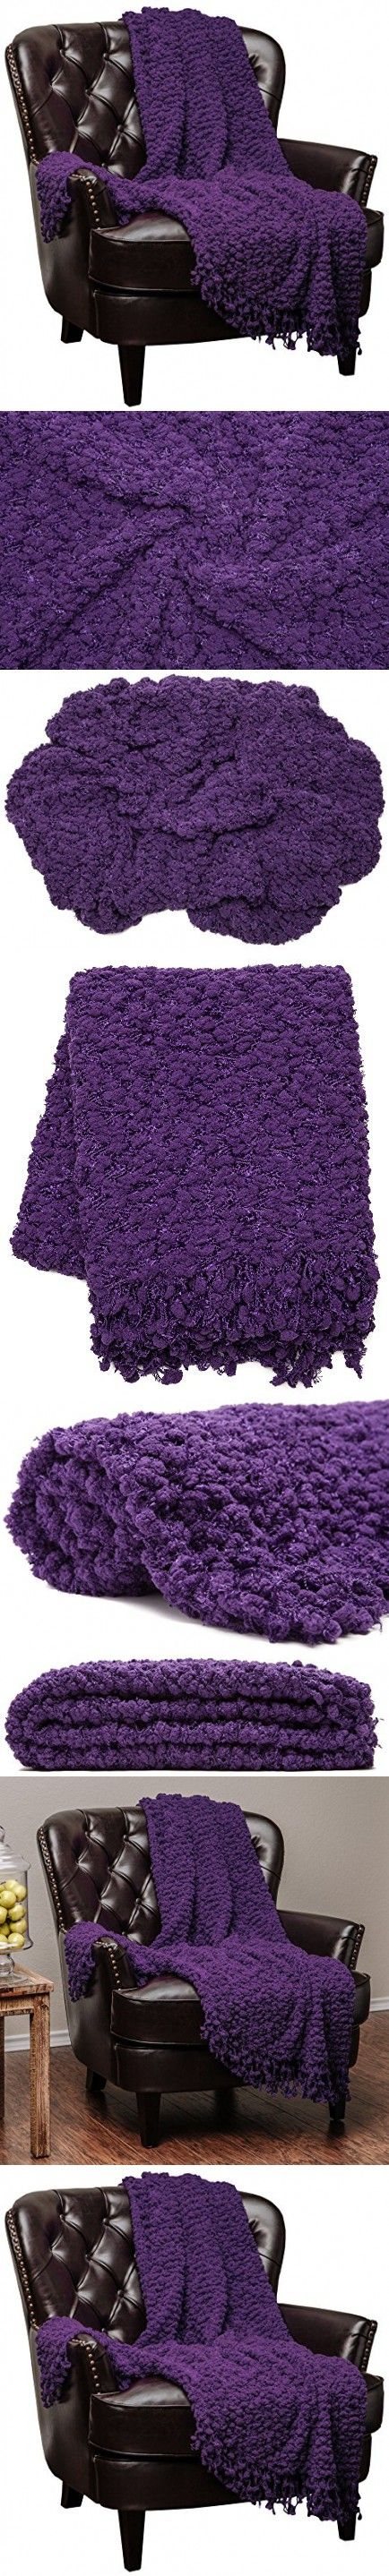 Chanasya Super Soft Beautiful Elegant Decorative Woven Popcorn Texture Couch Bed Purple Throw Blanket With Ball Fringe- Violet Aubergine